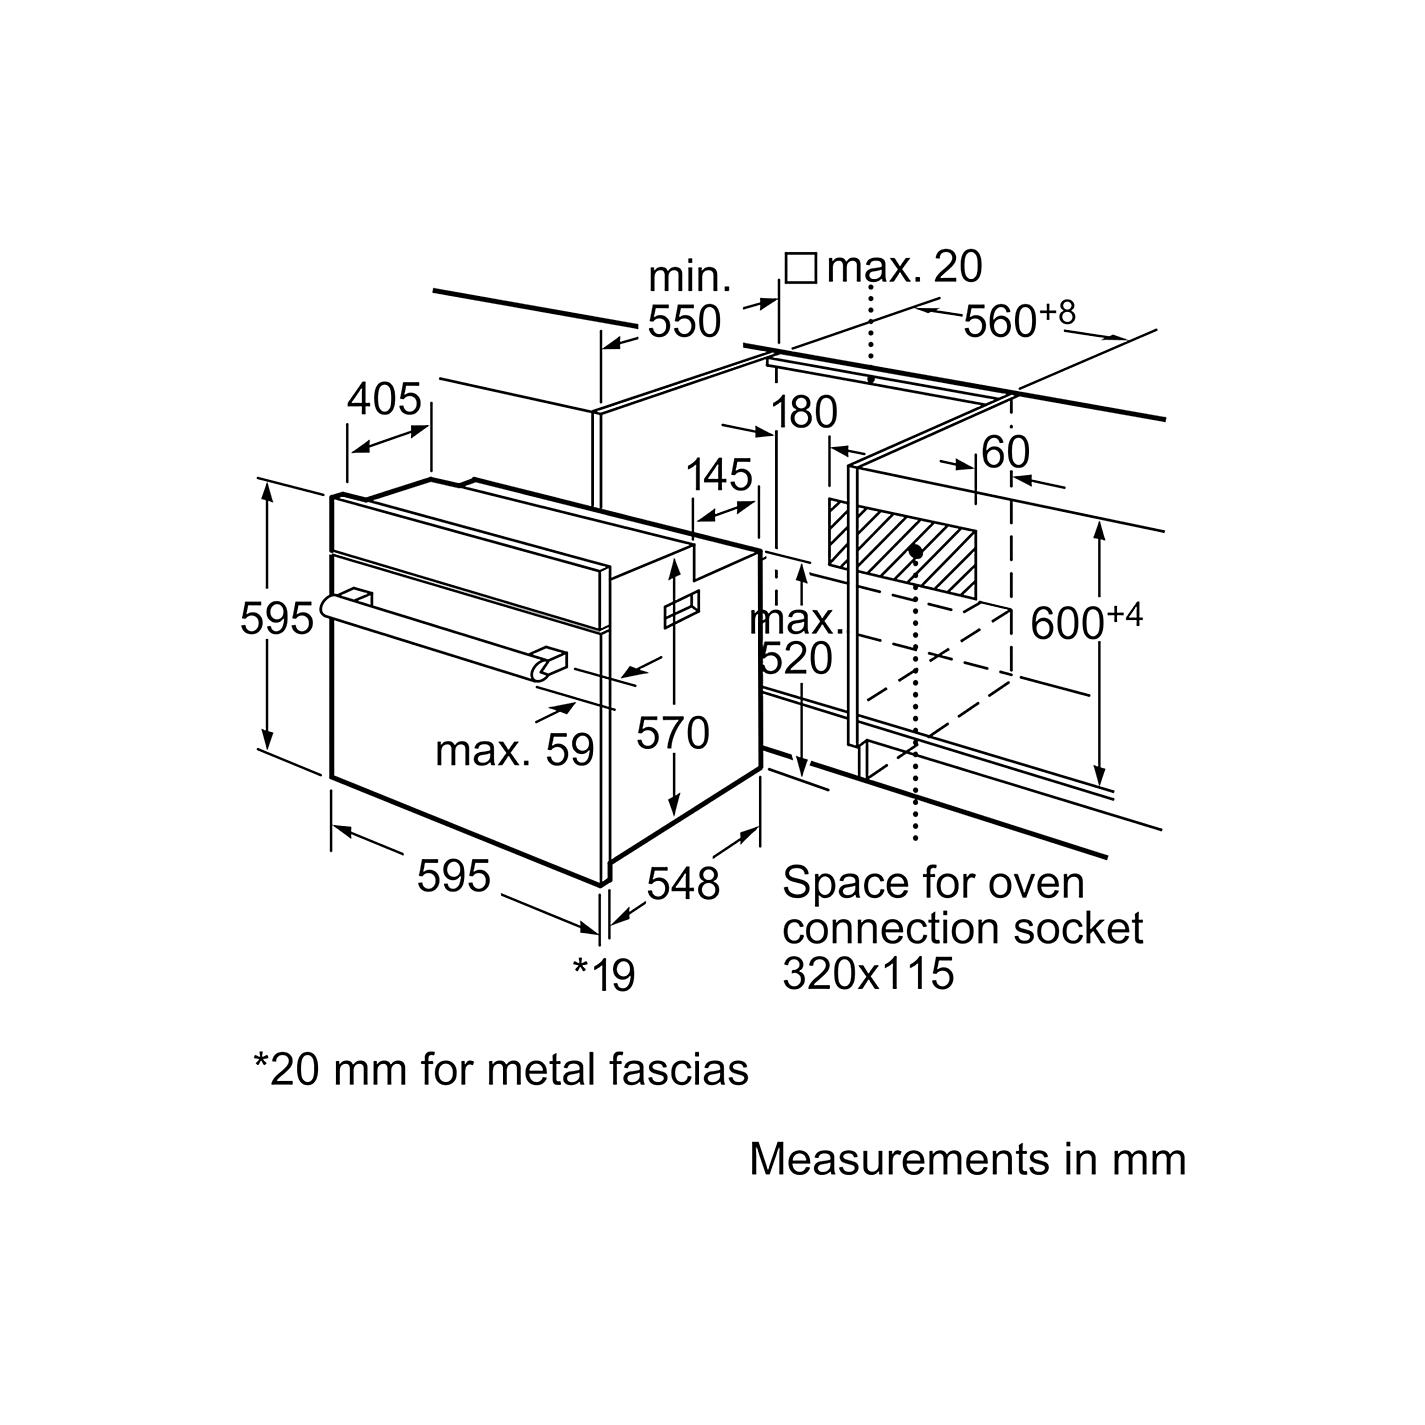 Dayton Gas Heater Parts Diagram - Wiring Diagram And Engine Diagram